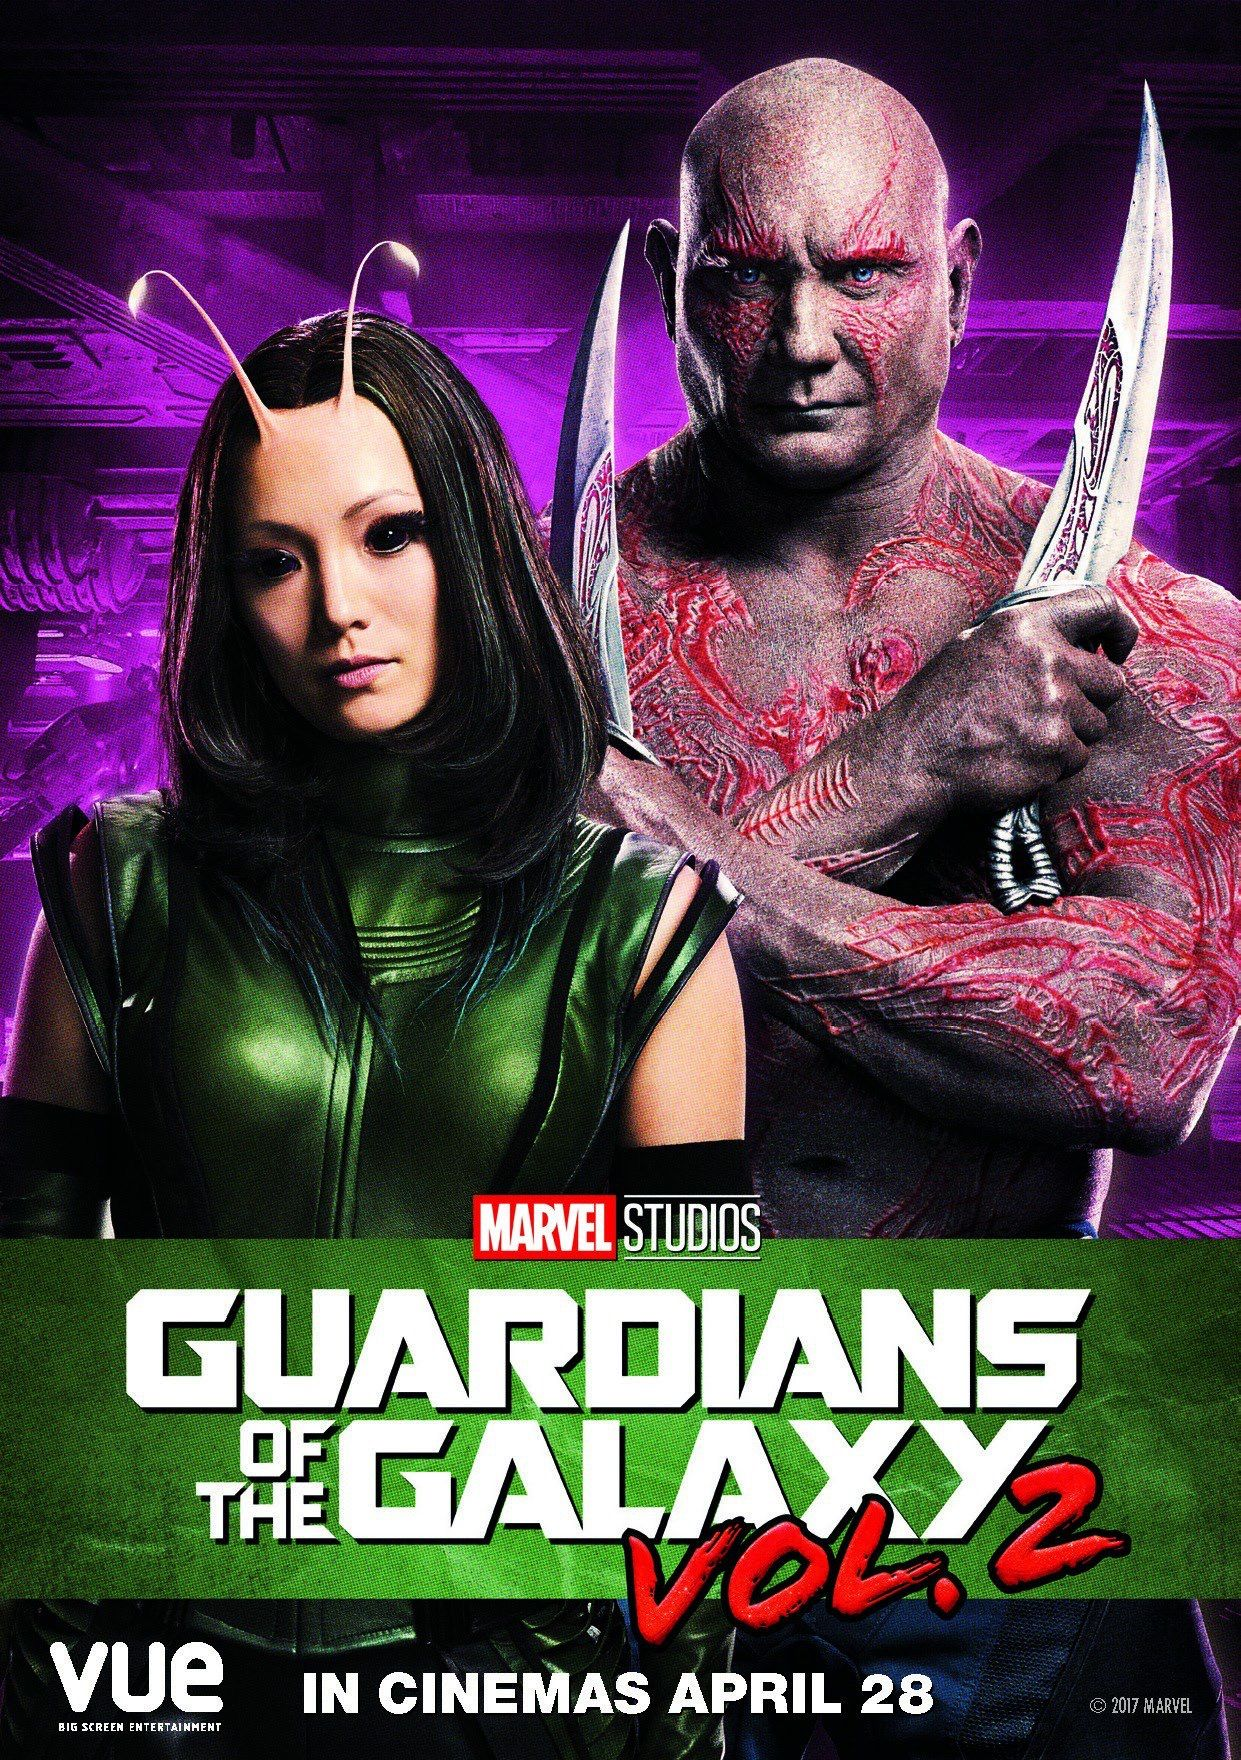 92c698104a14f8e22443f1786121a858 - Gardens Of The Galaxy Vol 2 Movie